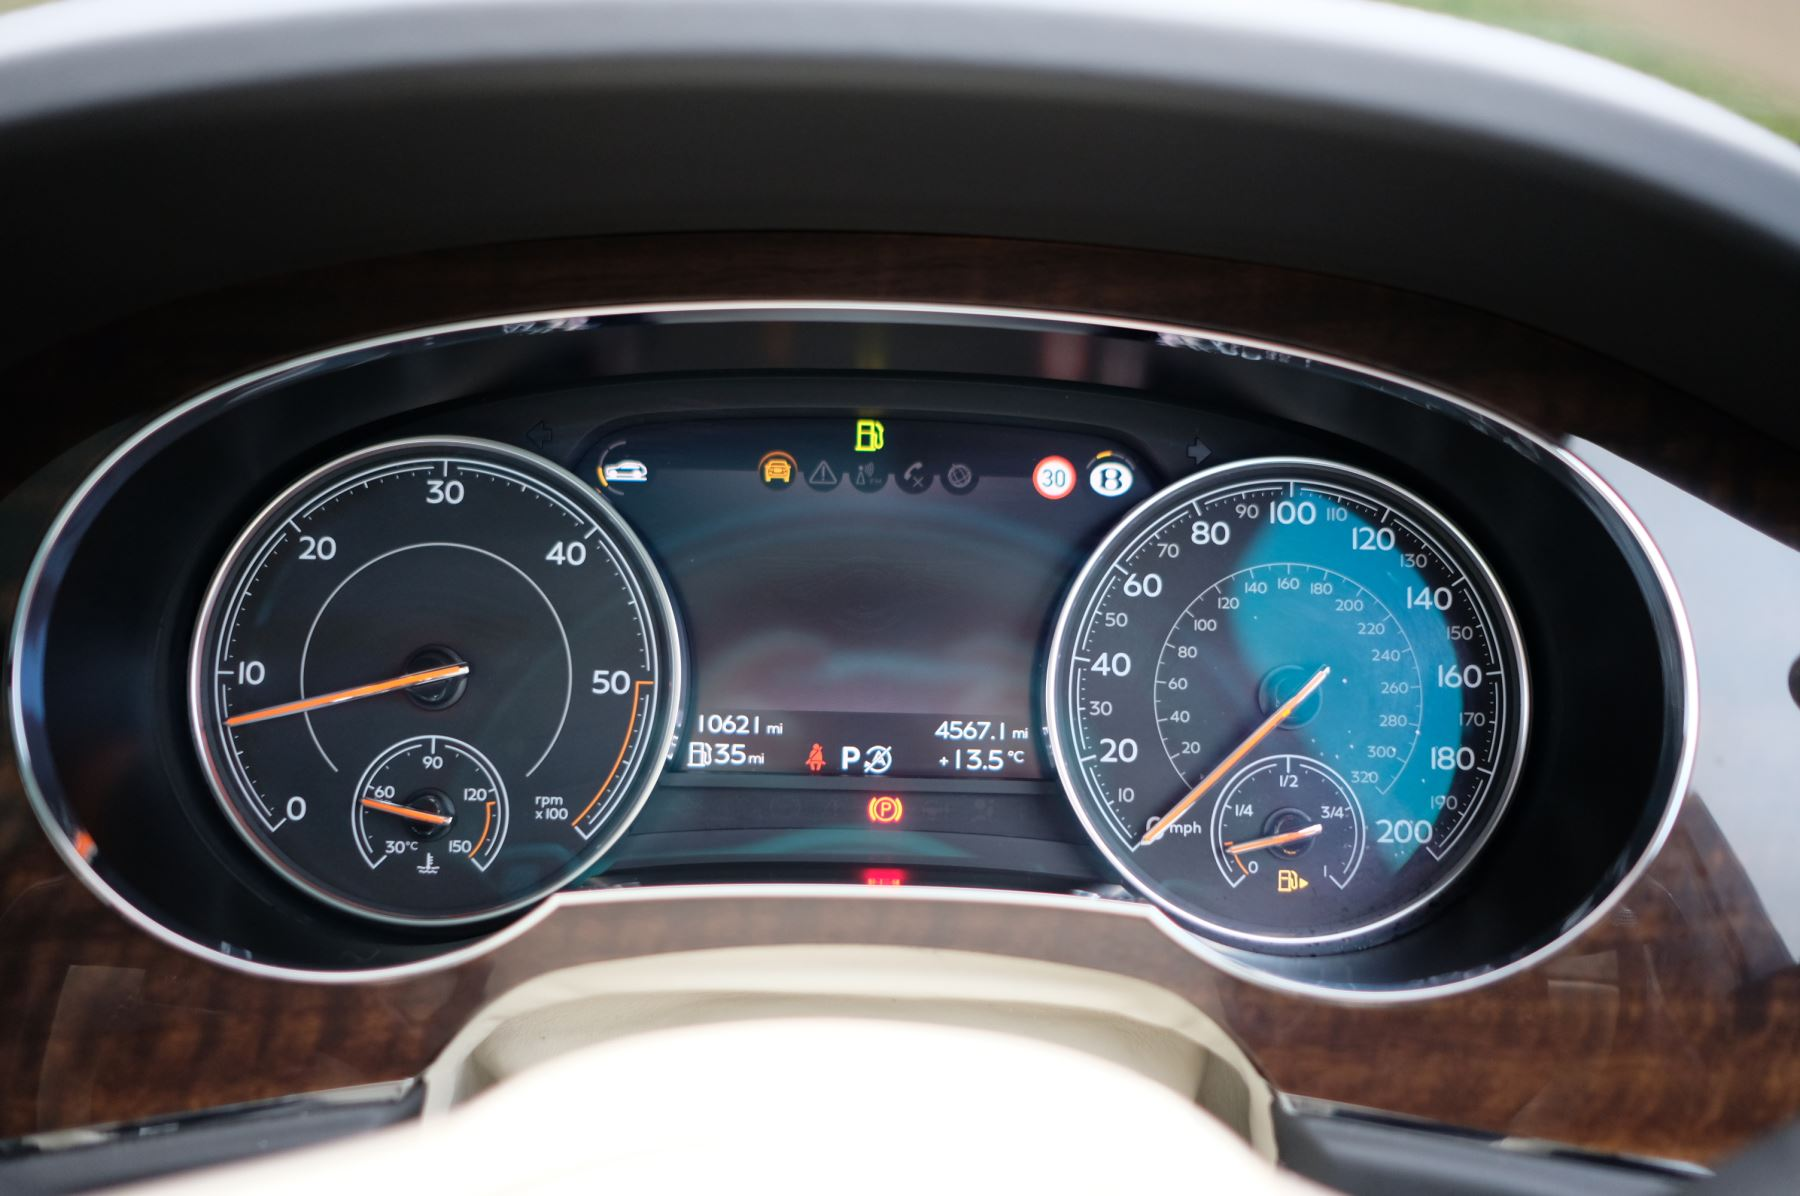 Bentley Bentayga Diesel 4.0 V8 Mulliner Driving Spec 5dr Auto - 7 Seat Specification image 21